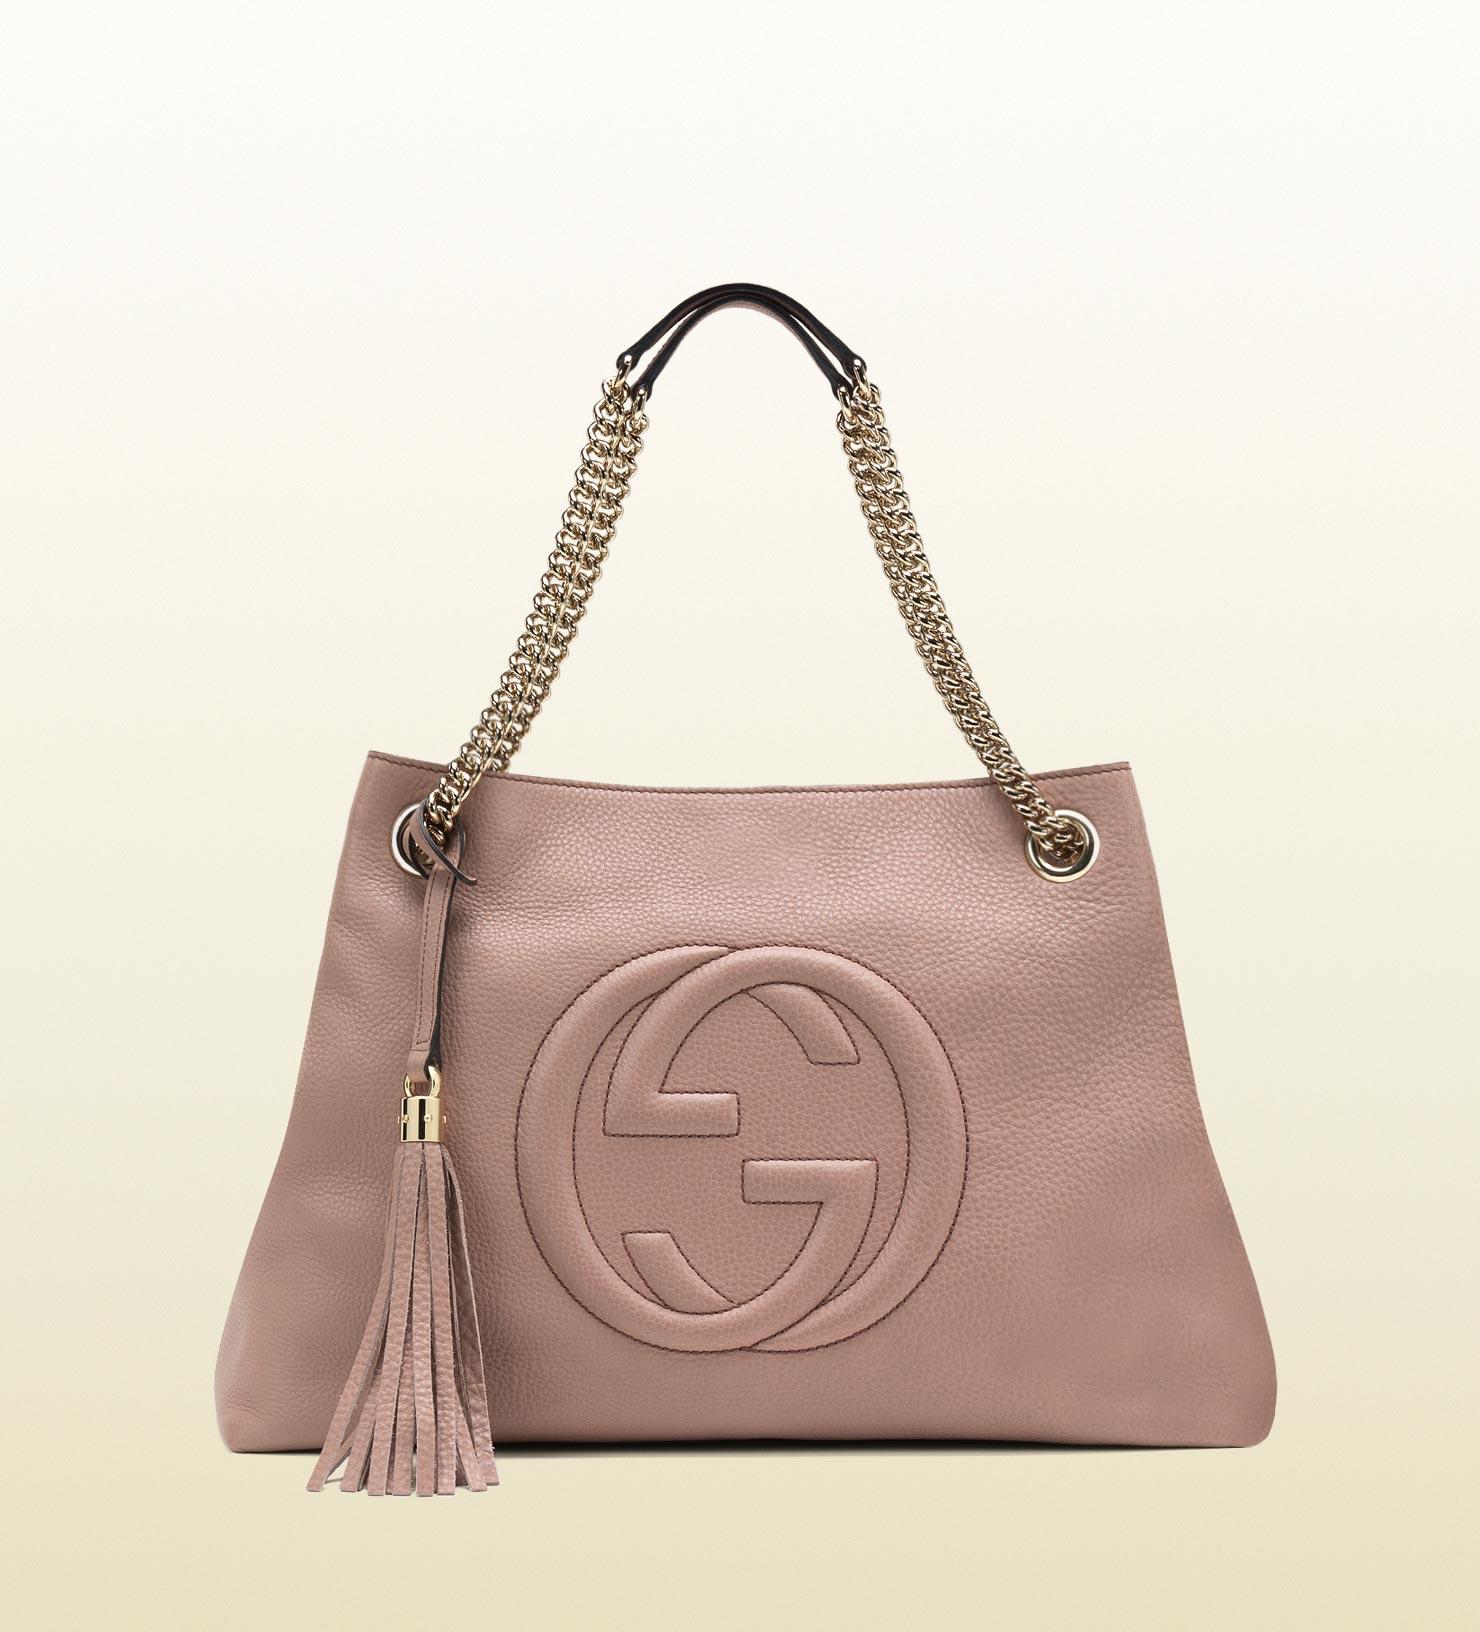 Gucci Soho Leather Shoulder Bag In Pink Lyst